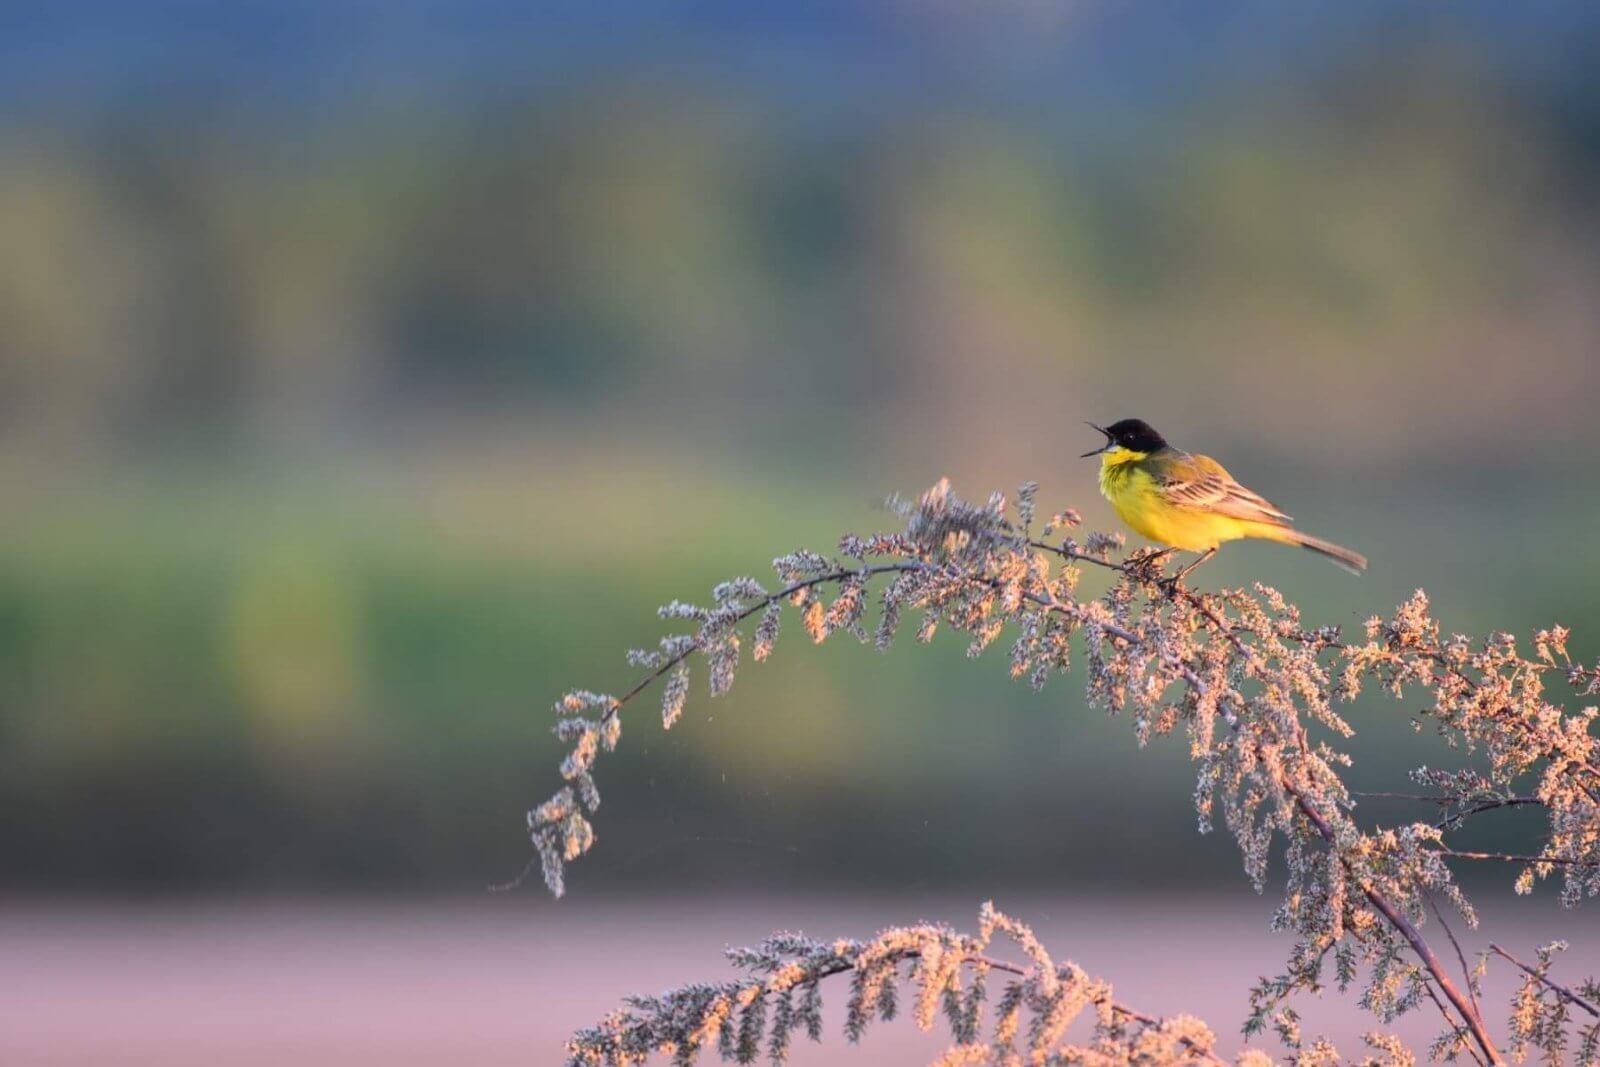 European Birdwatching weekend organized by Birdlife International